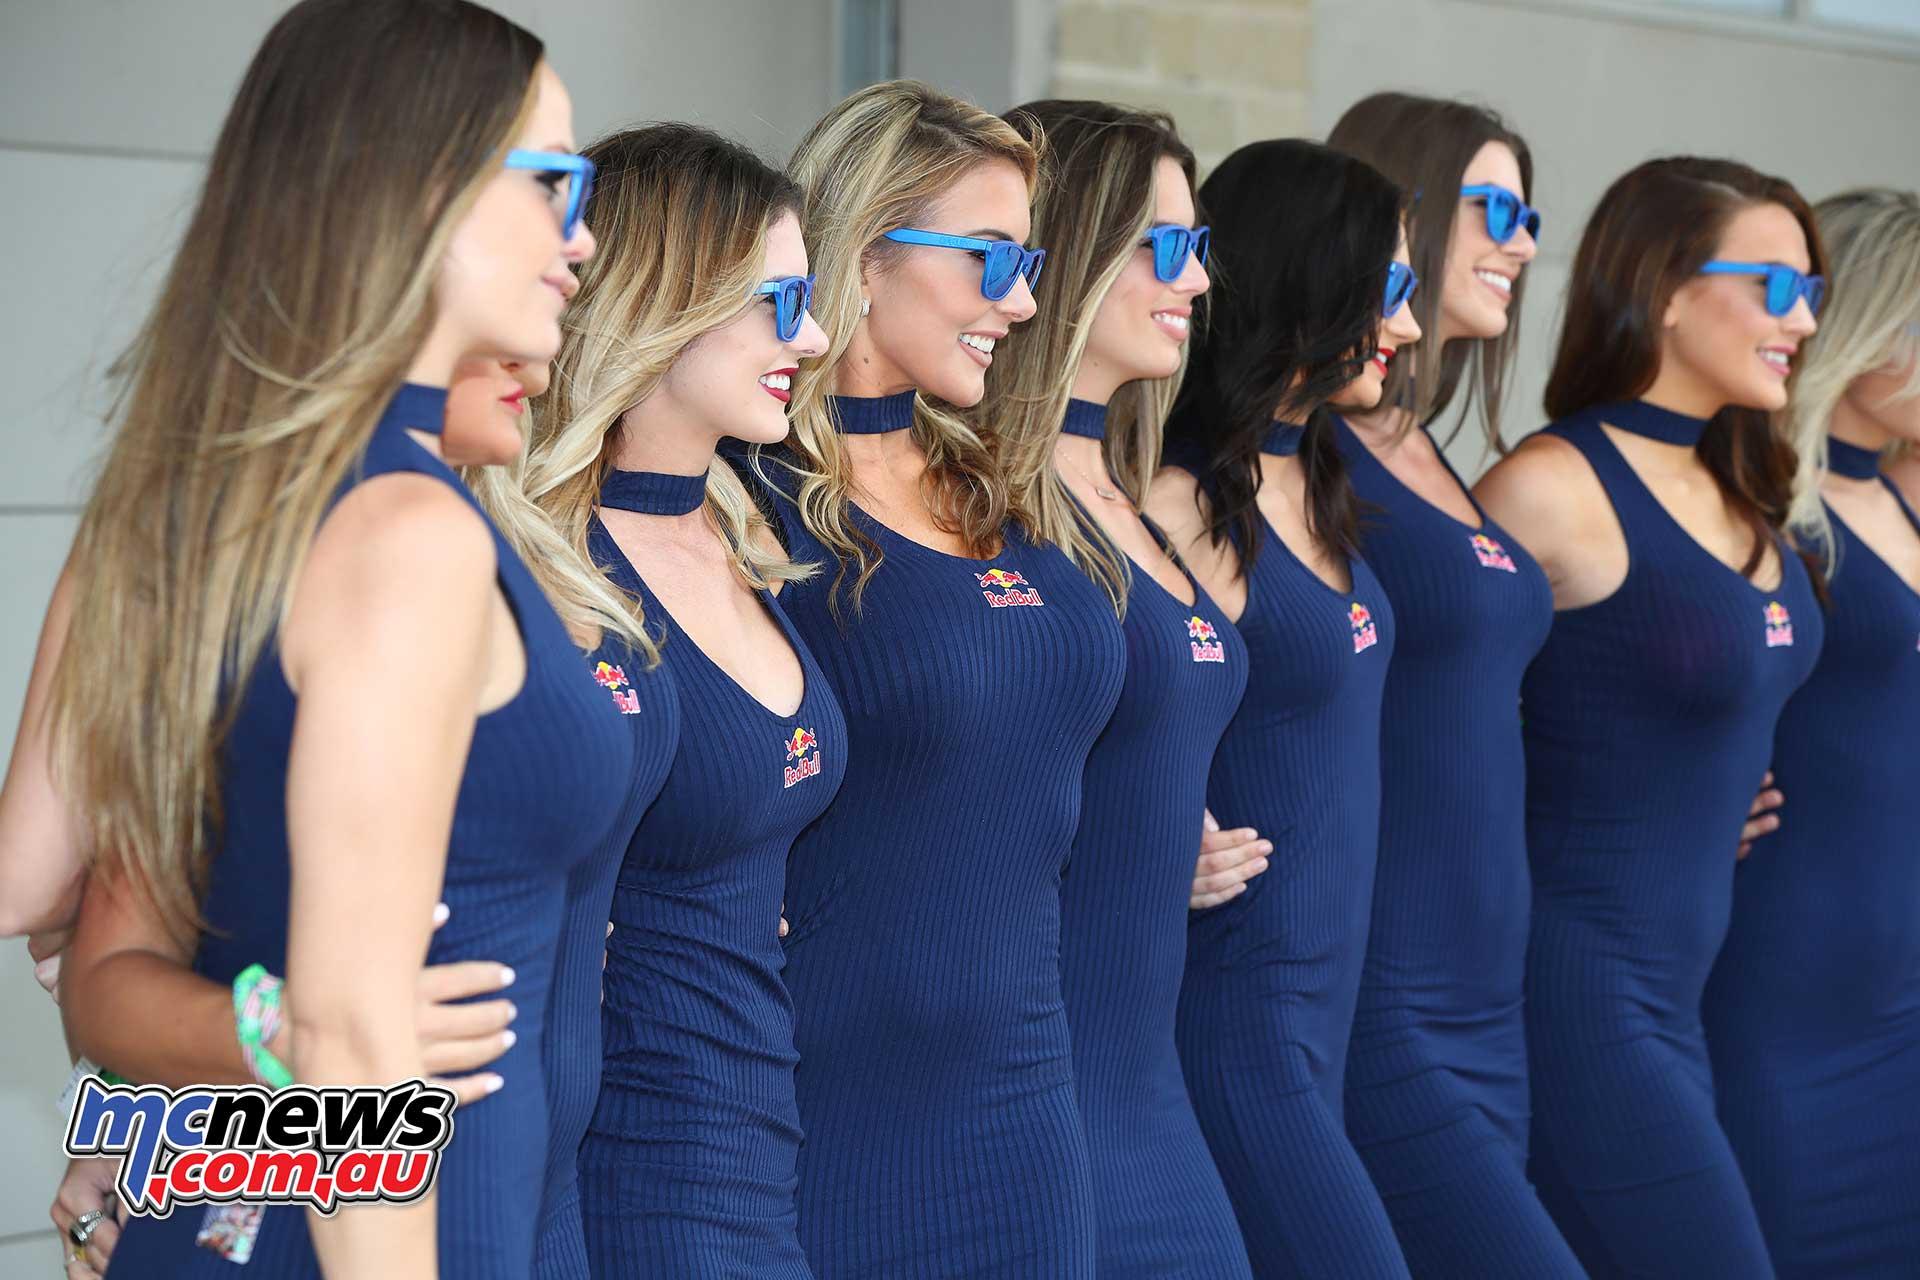 2018 COTA MotoGP Images   Grid Girls   MCNews.com.au